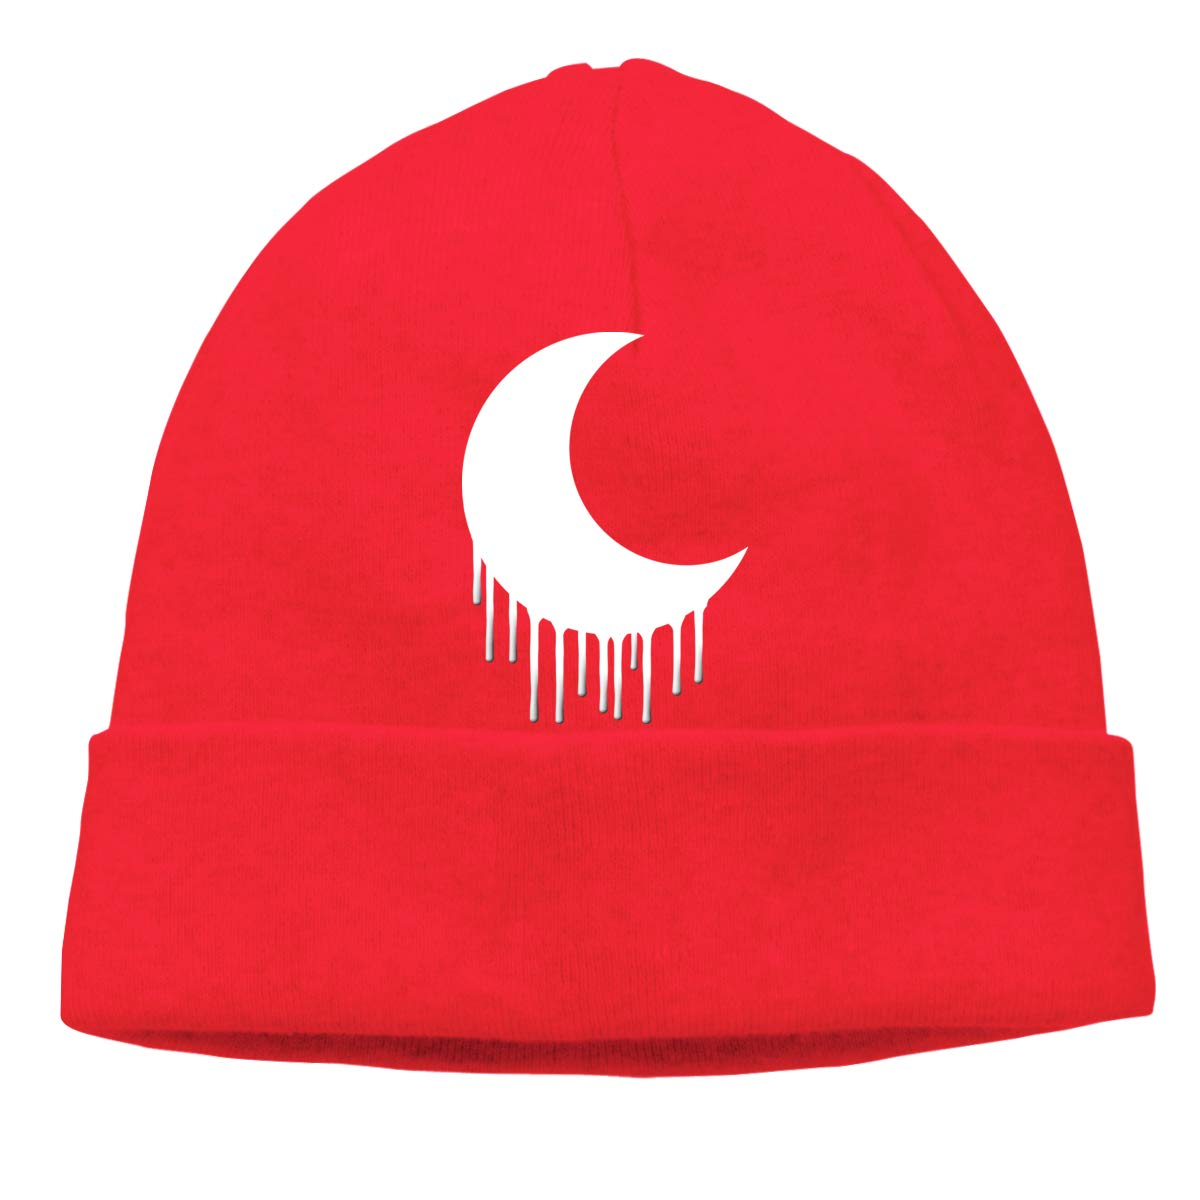 Edgy Goth Crescent Moon Mens Beanie Cap Skull Cap Winter Warm Knitting Hats.